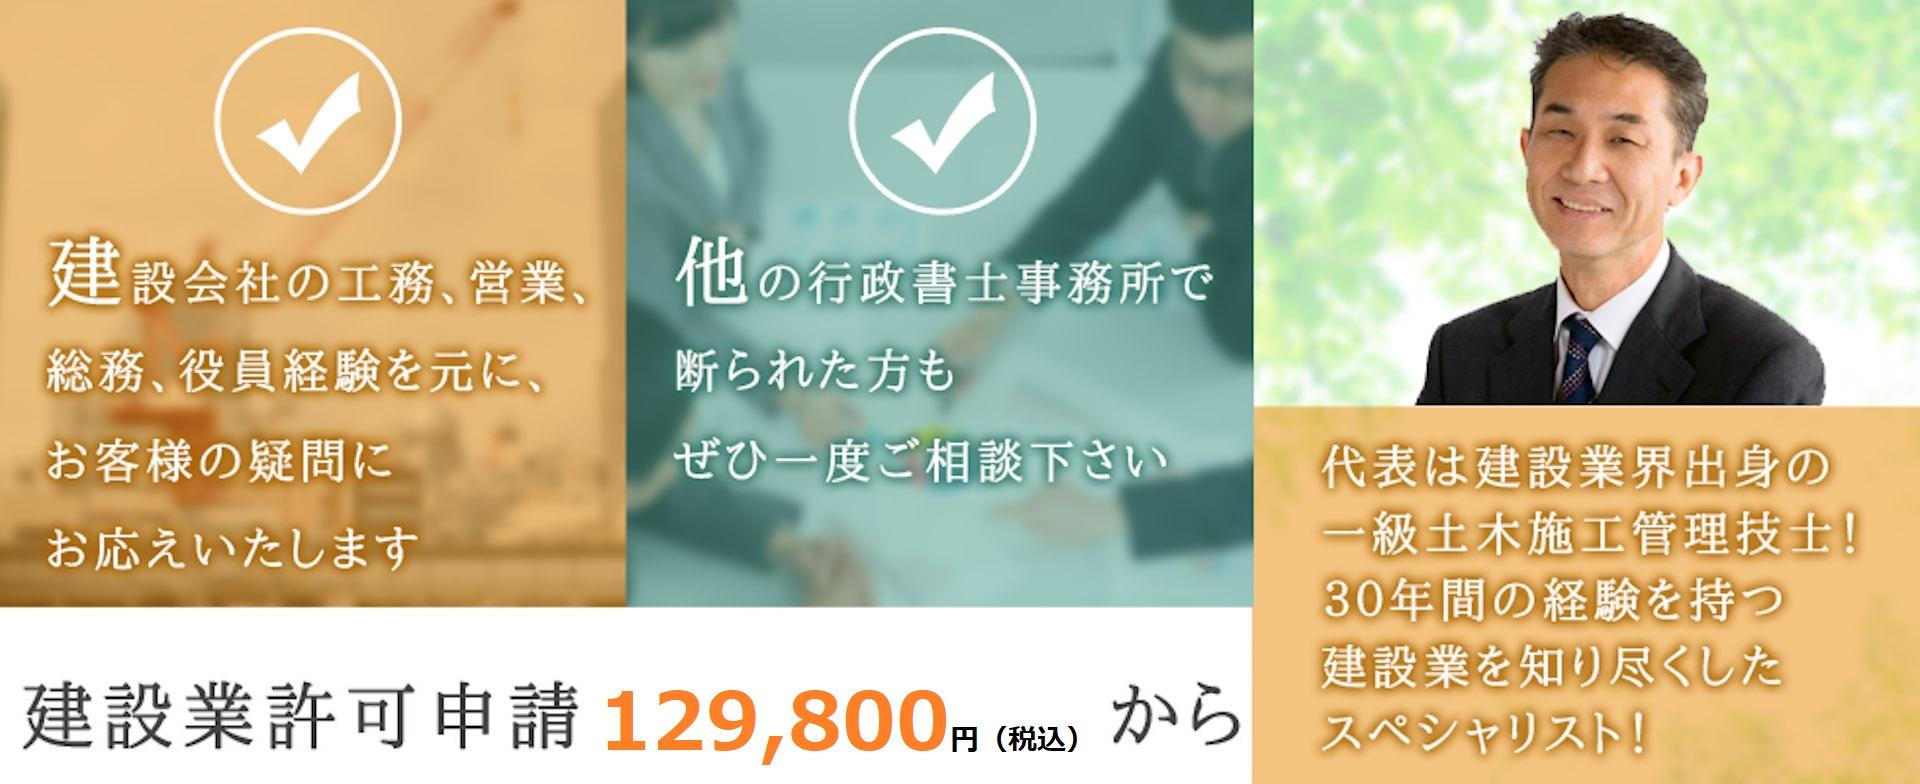 茨城県の建設業許可